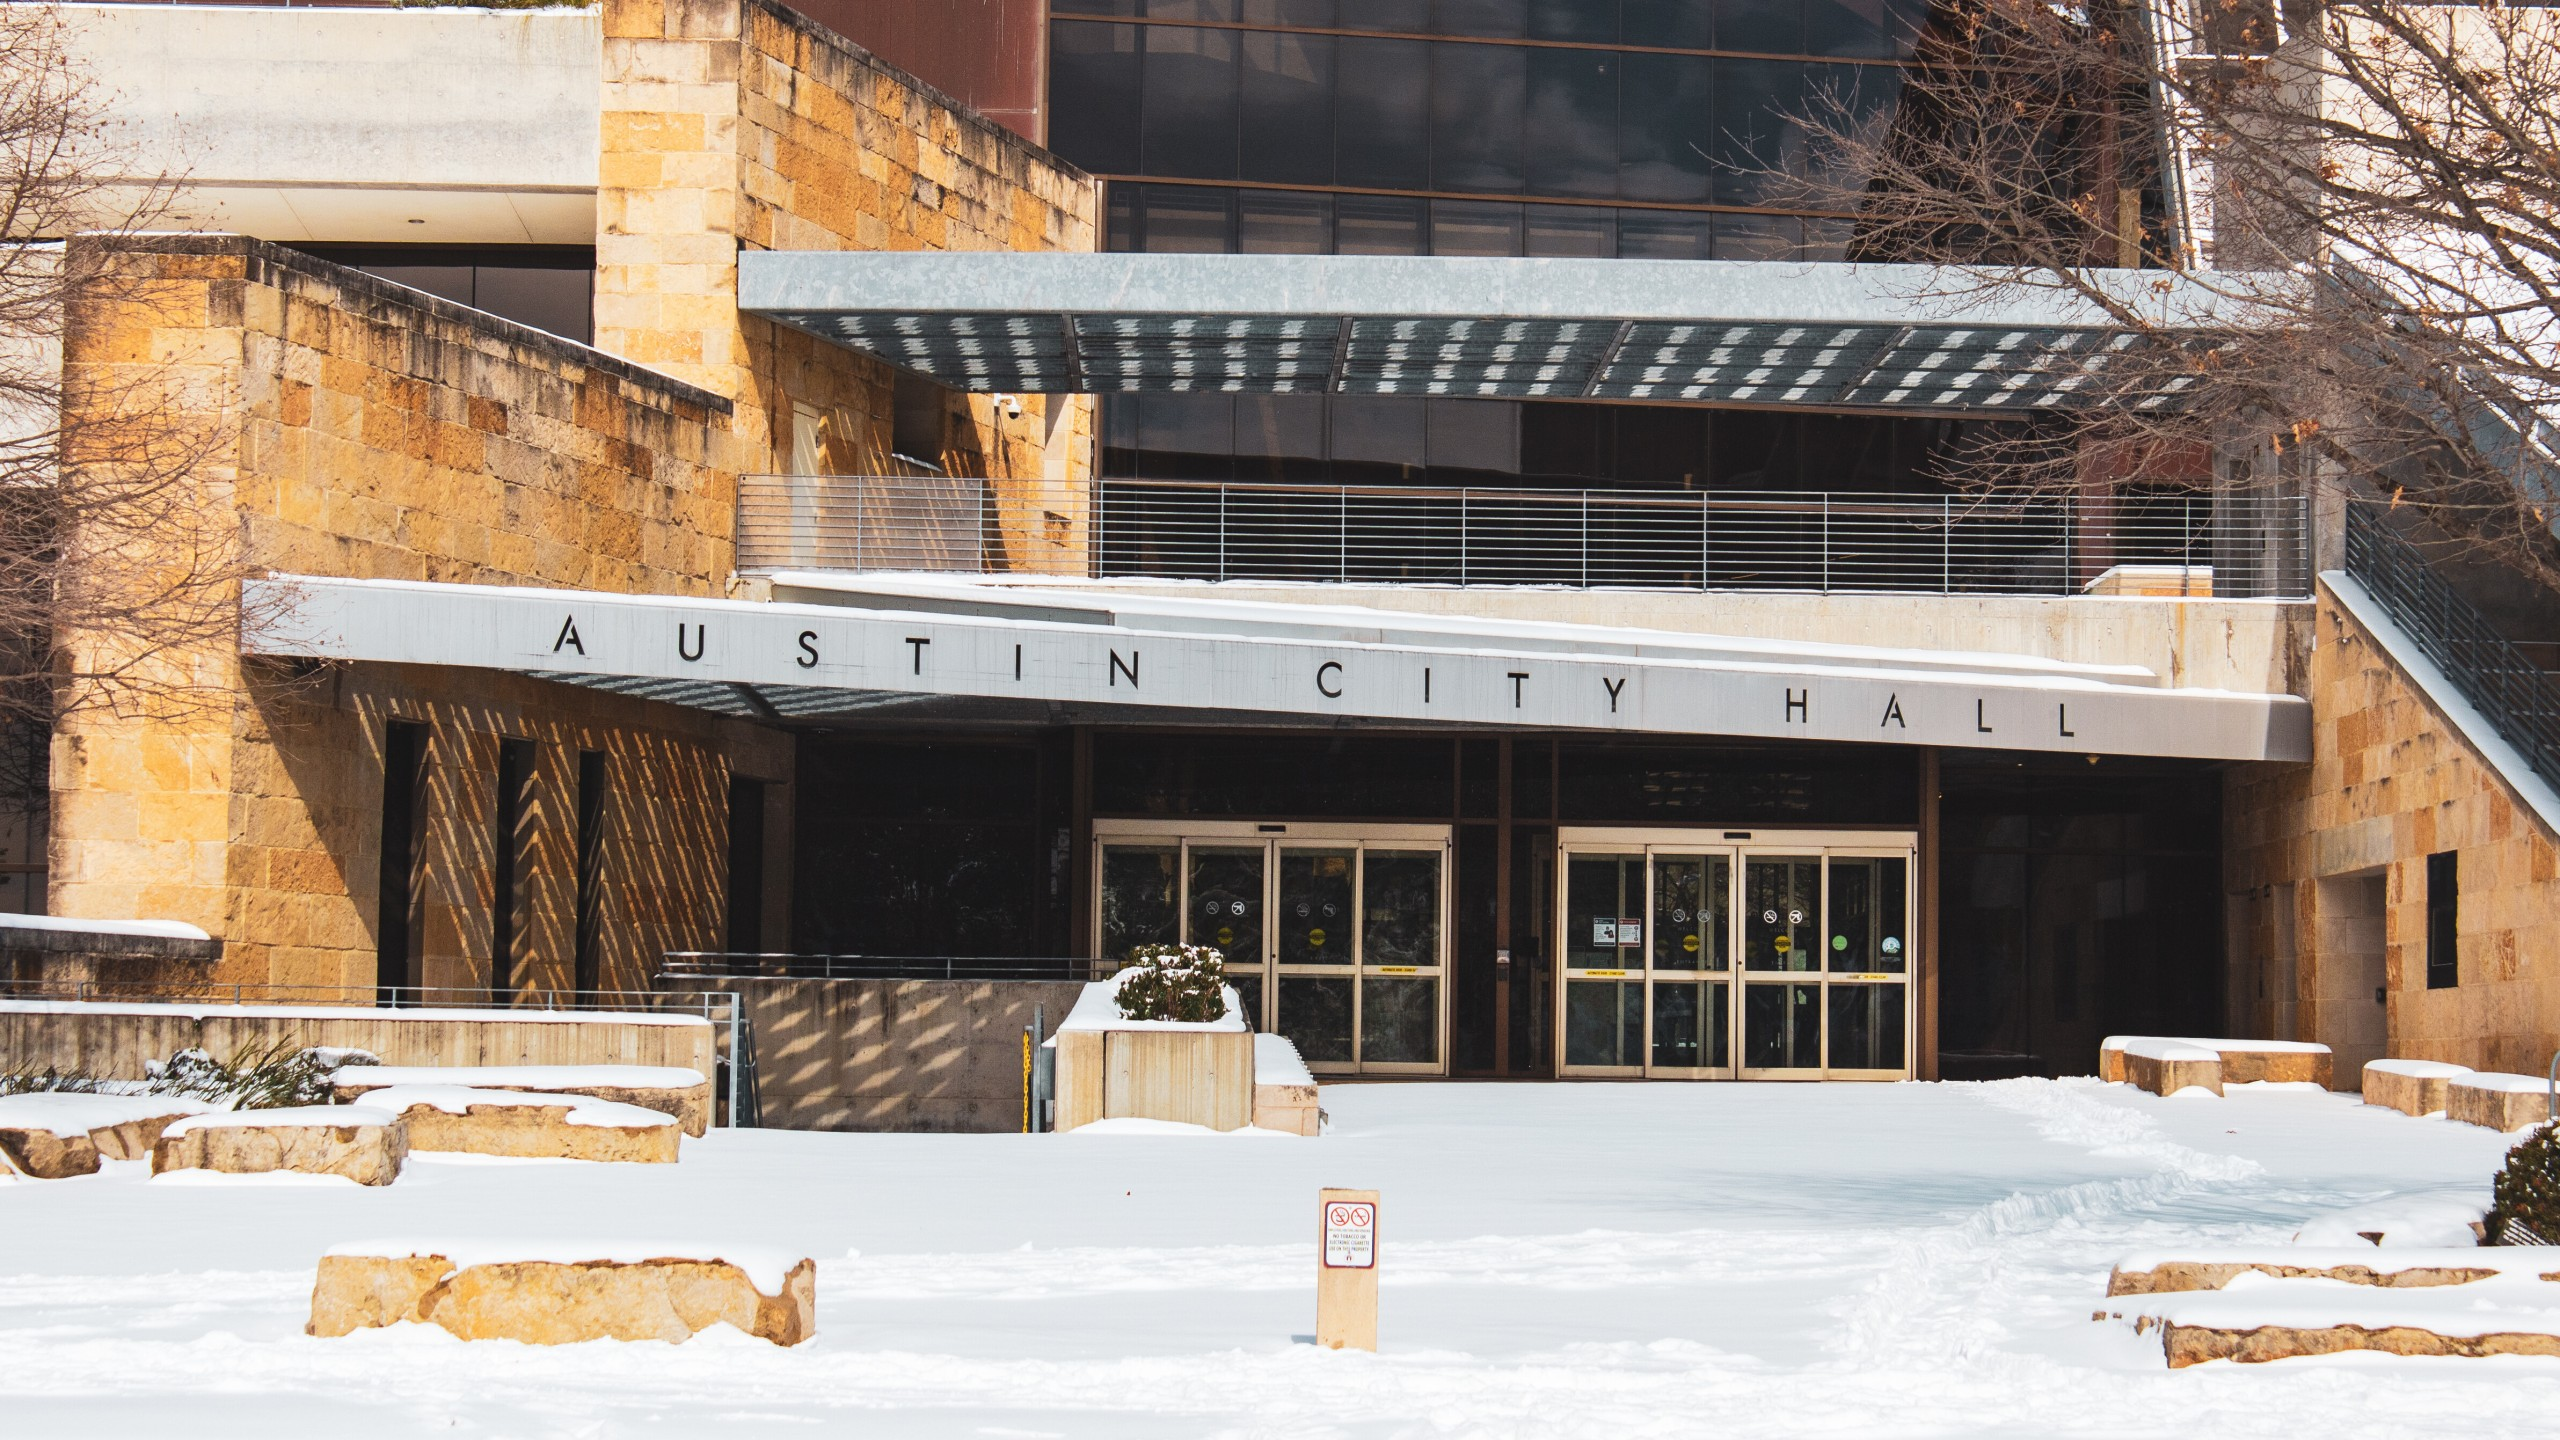 Austin City Hall on Feb. 15, 2021 (Saul Hannibal Photo)